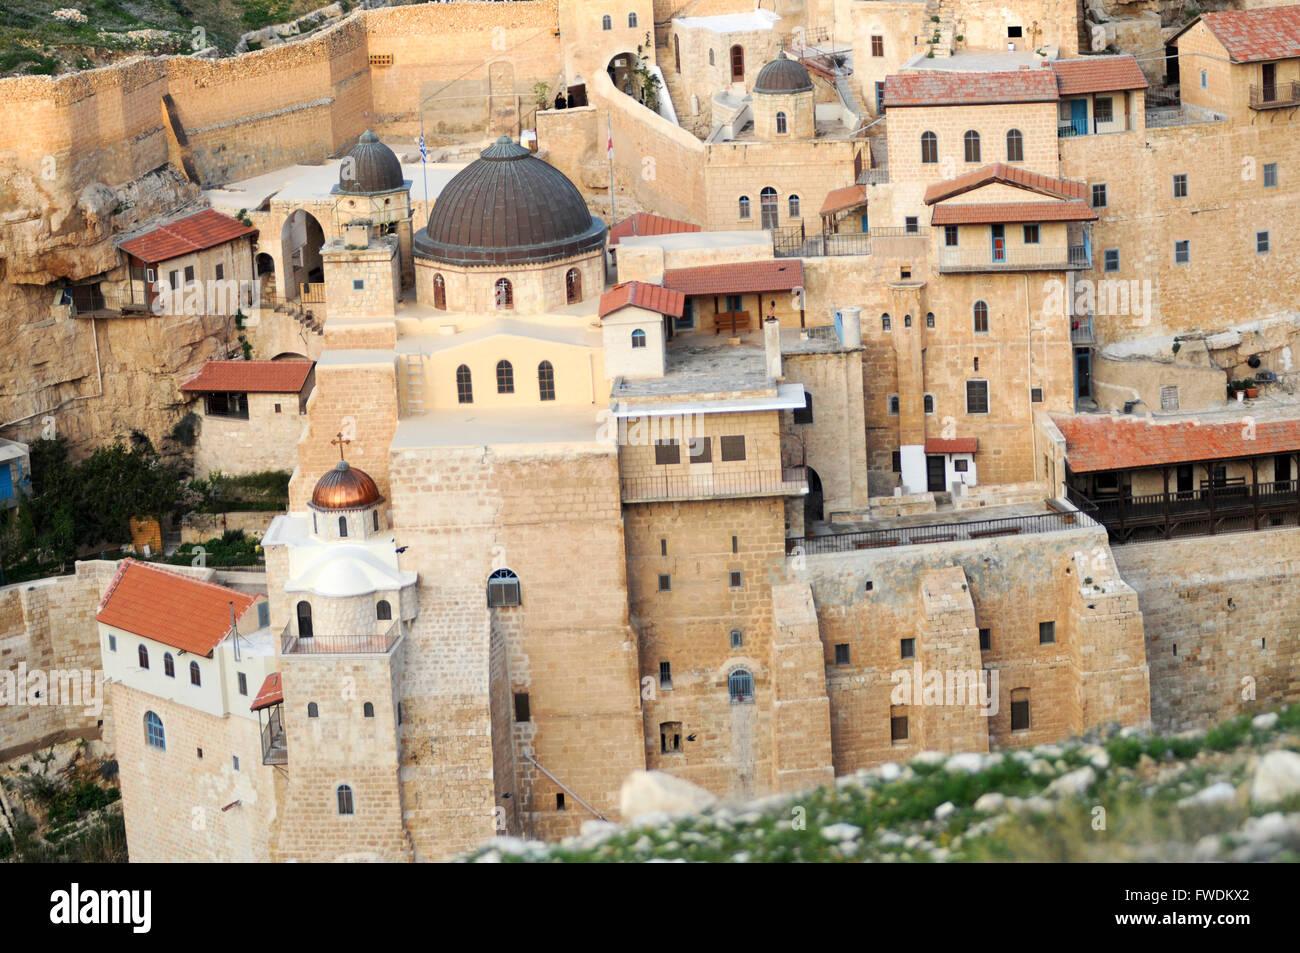 Israel, Judaea Dessert, Wadi Kidron, The Great Lavra of St. Sabas (also Mar Saba) is a Greek Orthodox monastery - Stock Image